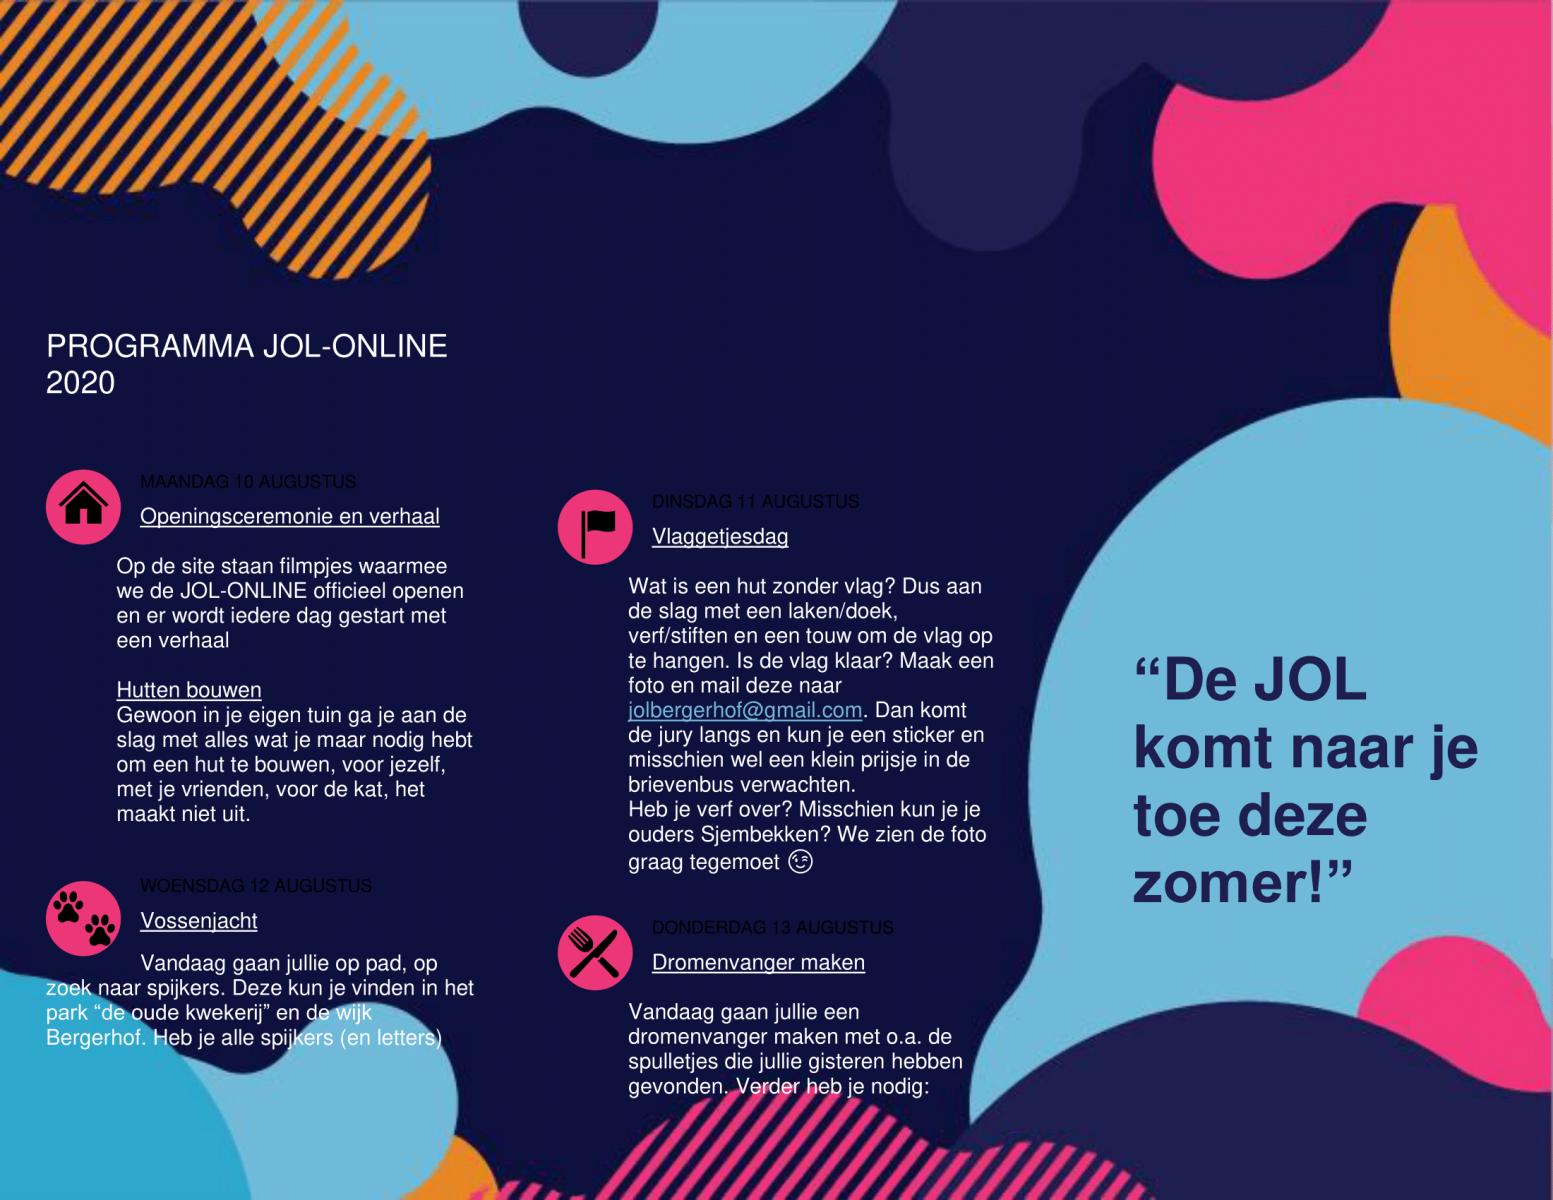 Programma_JOL-online-2